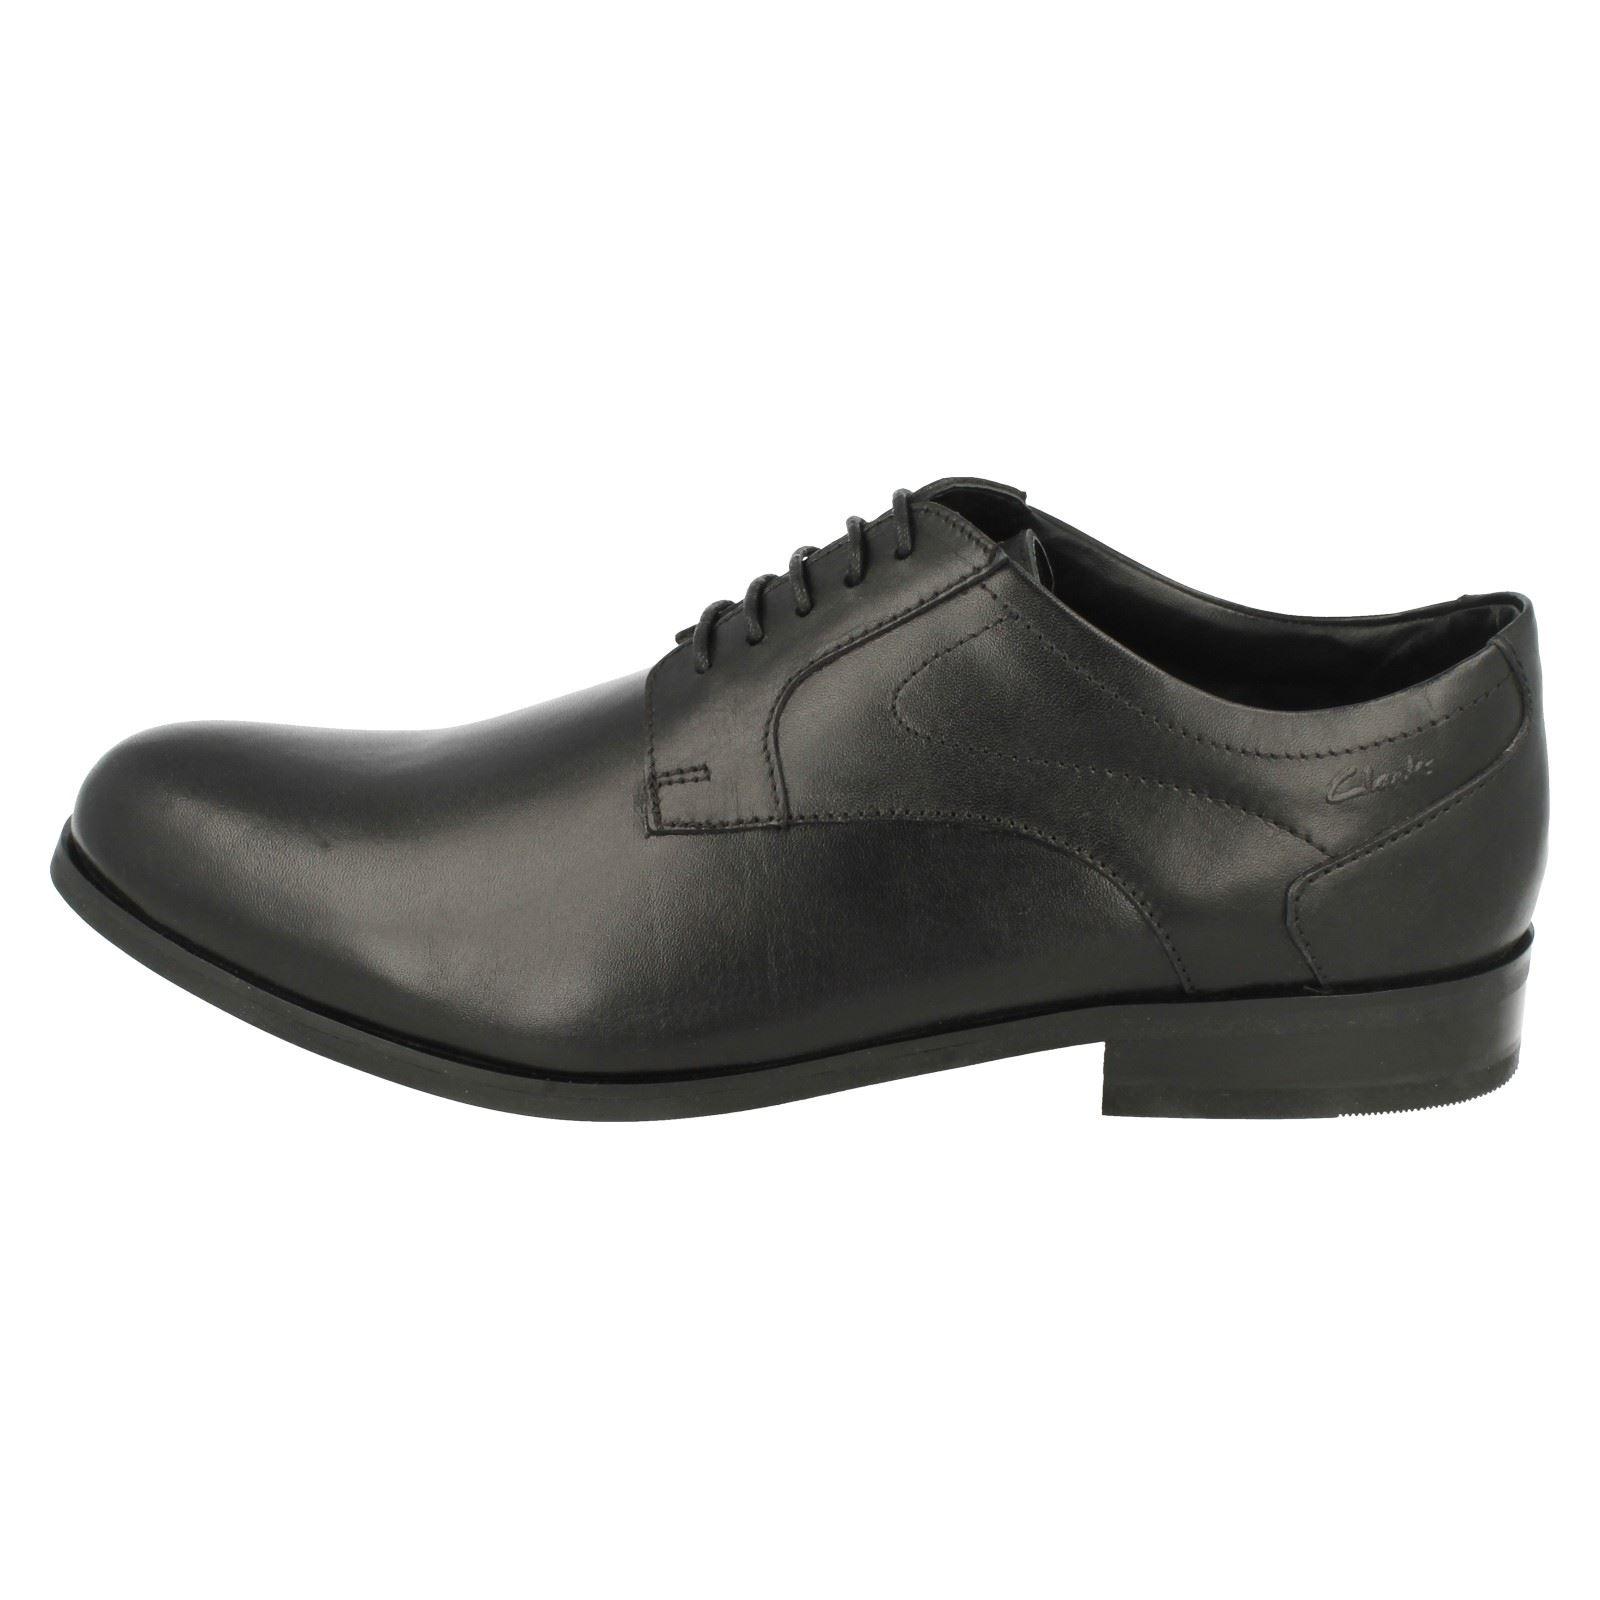 hombre Brint para Plain zapatos negro Clarks formales nCwUZUW